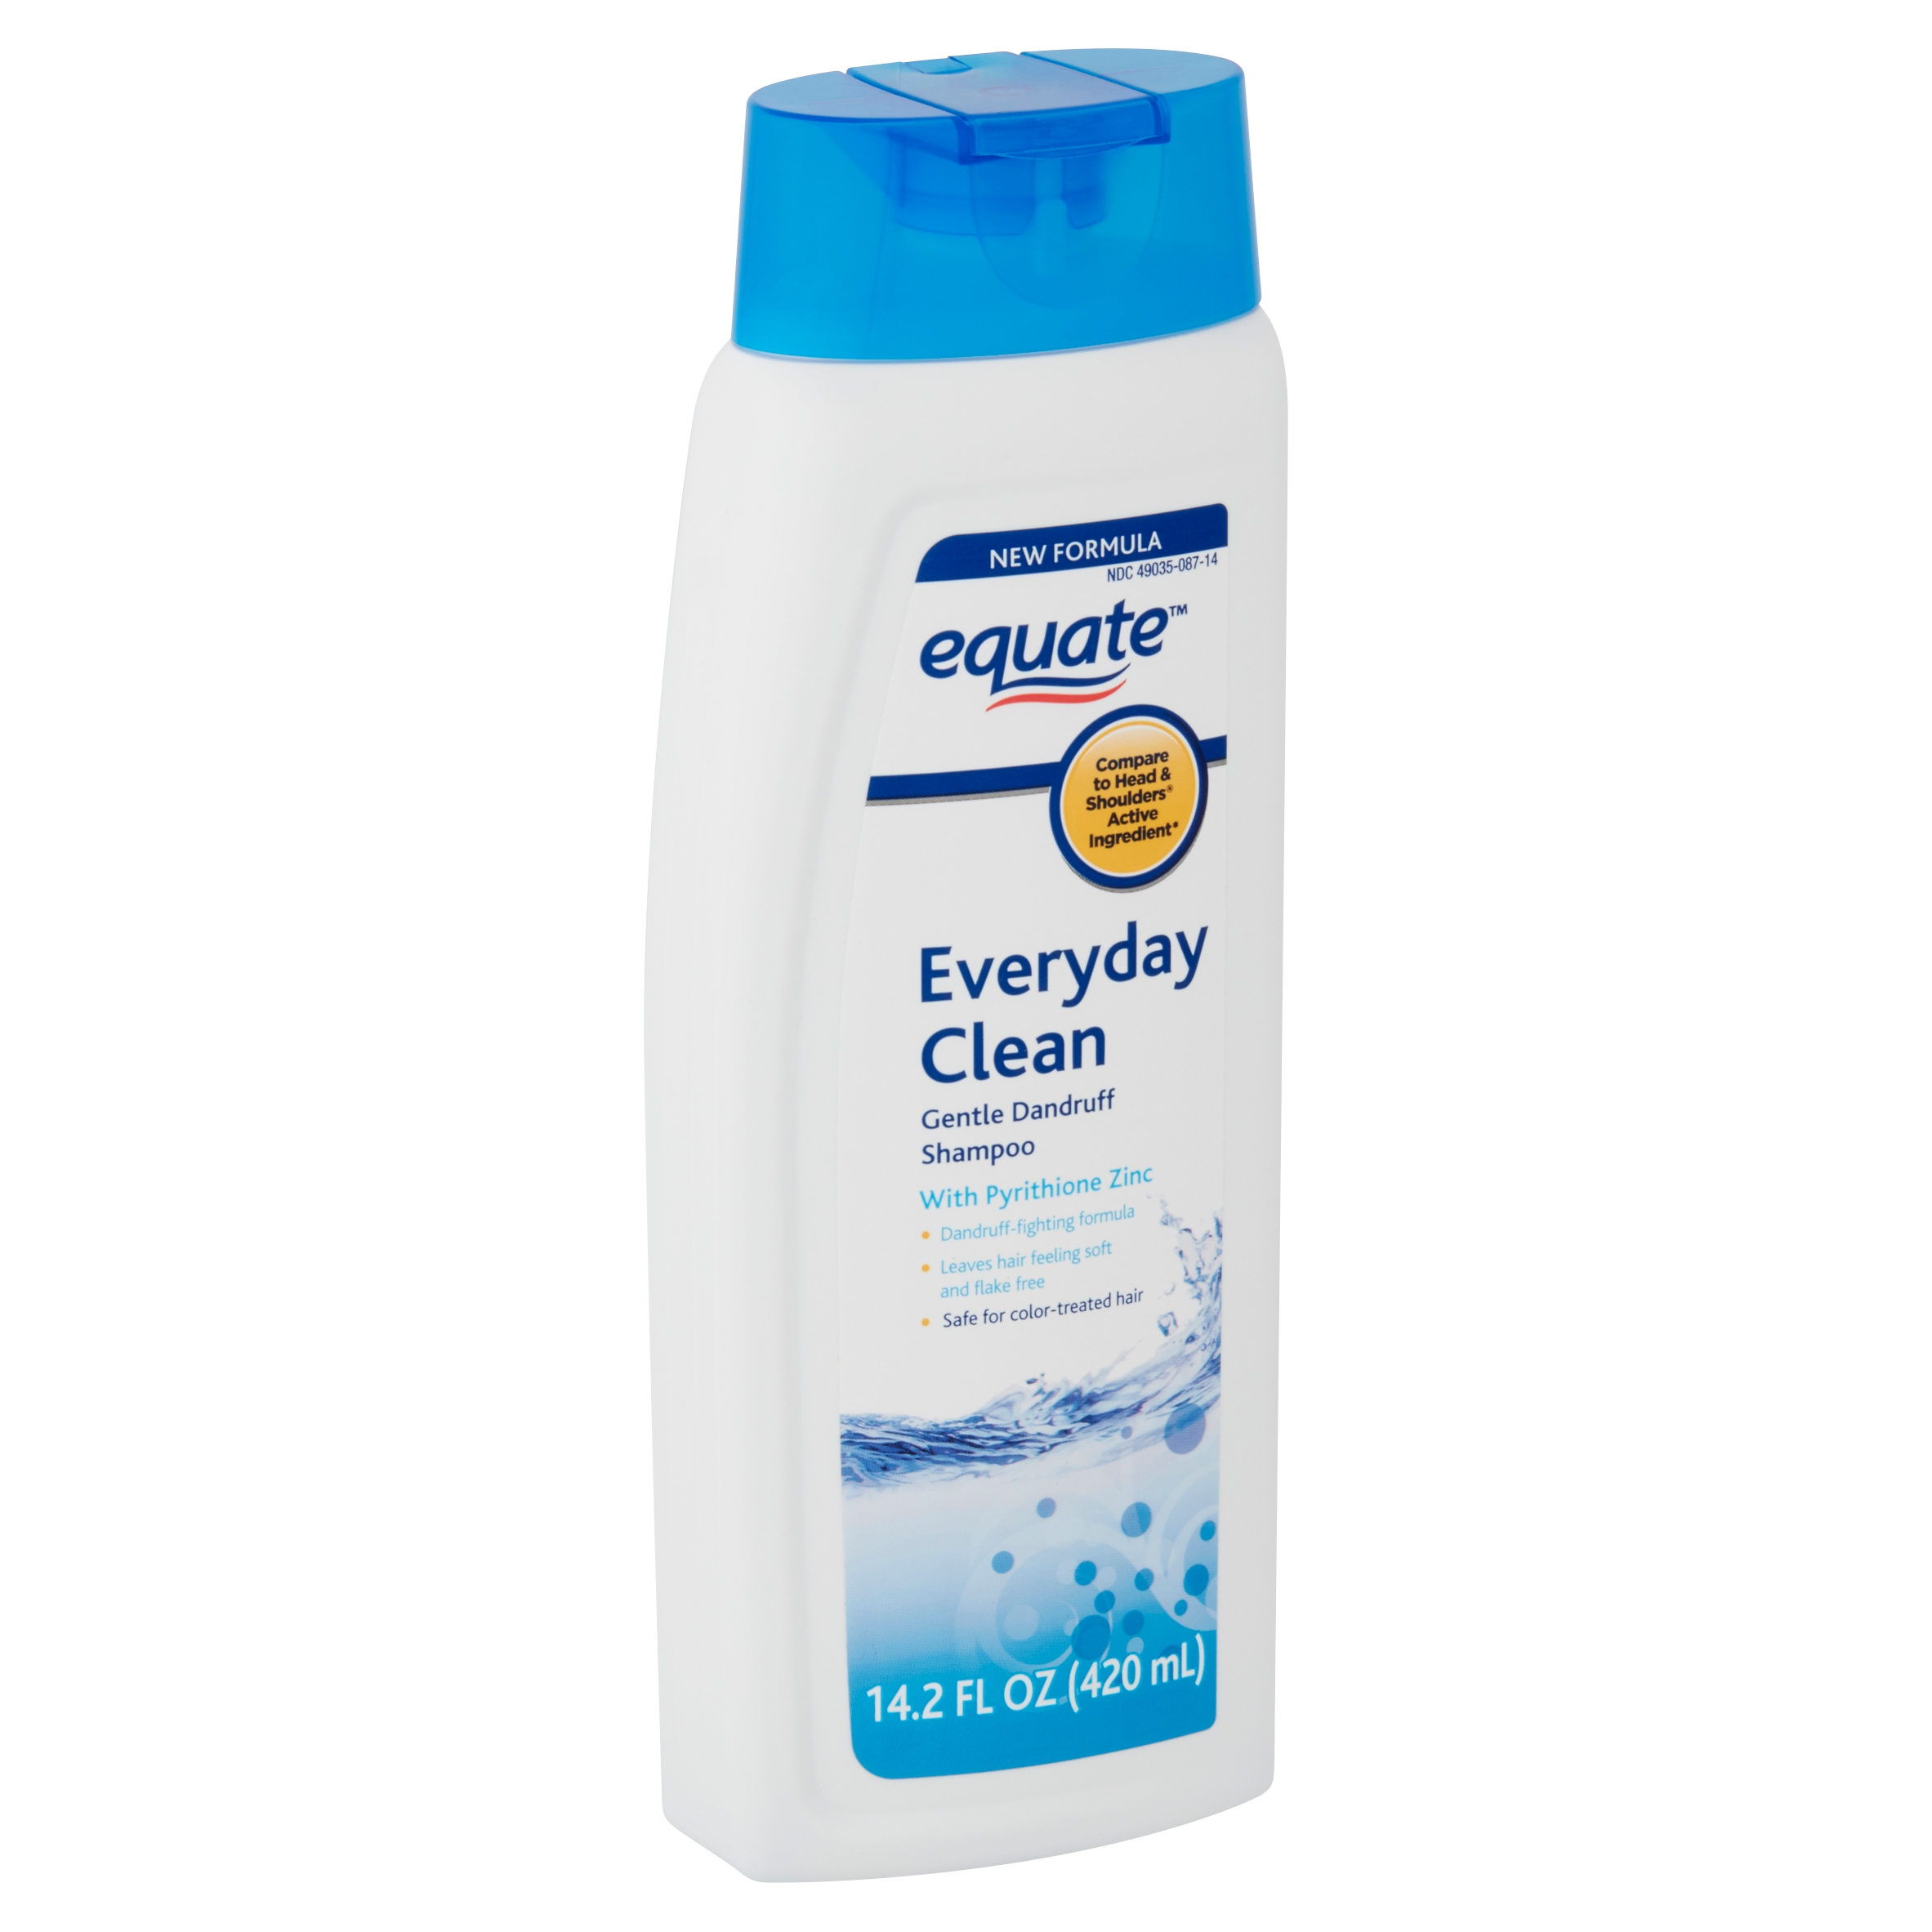 Equate Everyday Clean Gentle Dandruff Shampoo, 14.2 fl oz